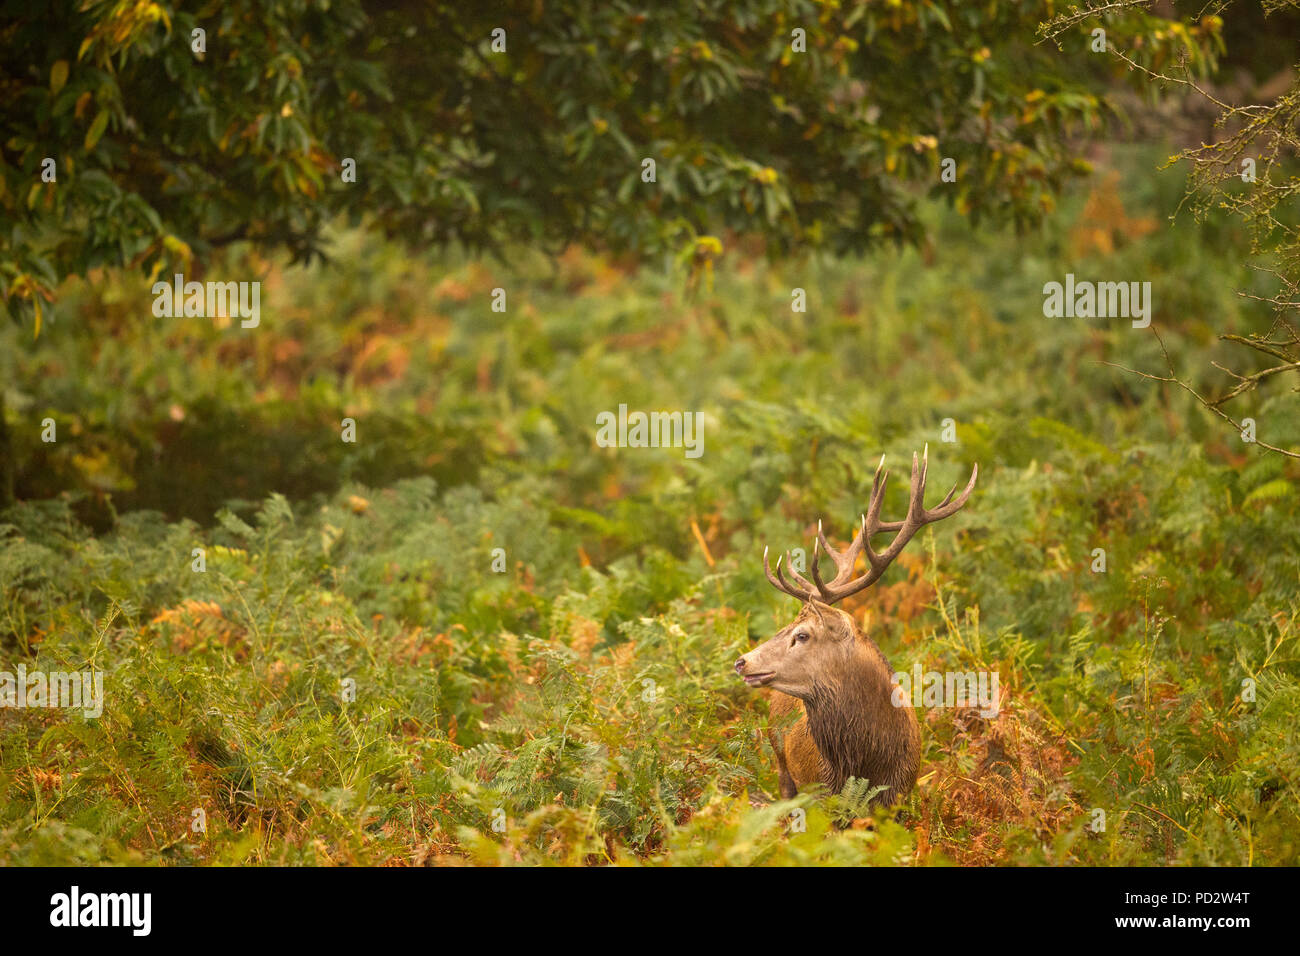 Red Deer Cervus elaphus - Stock Image